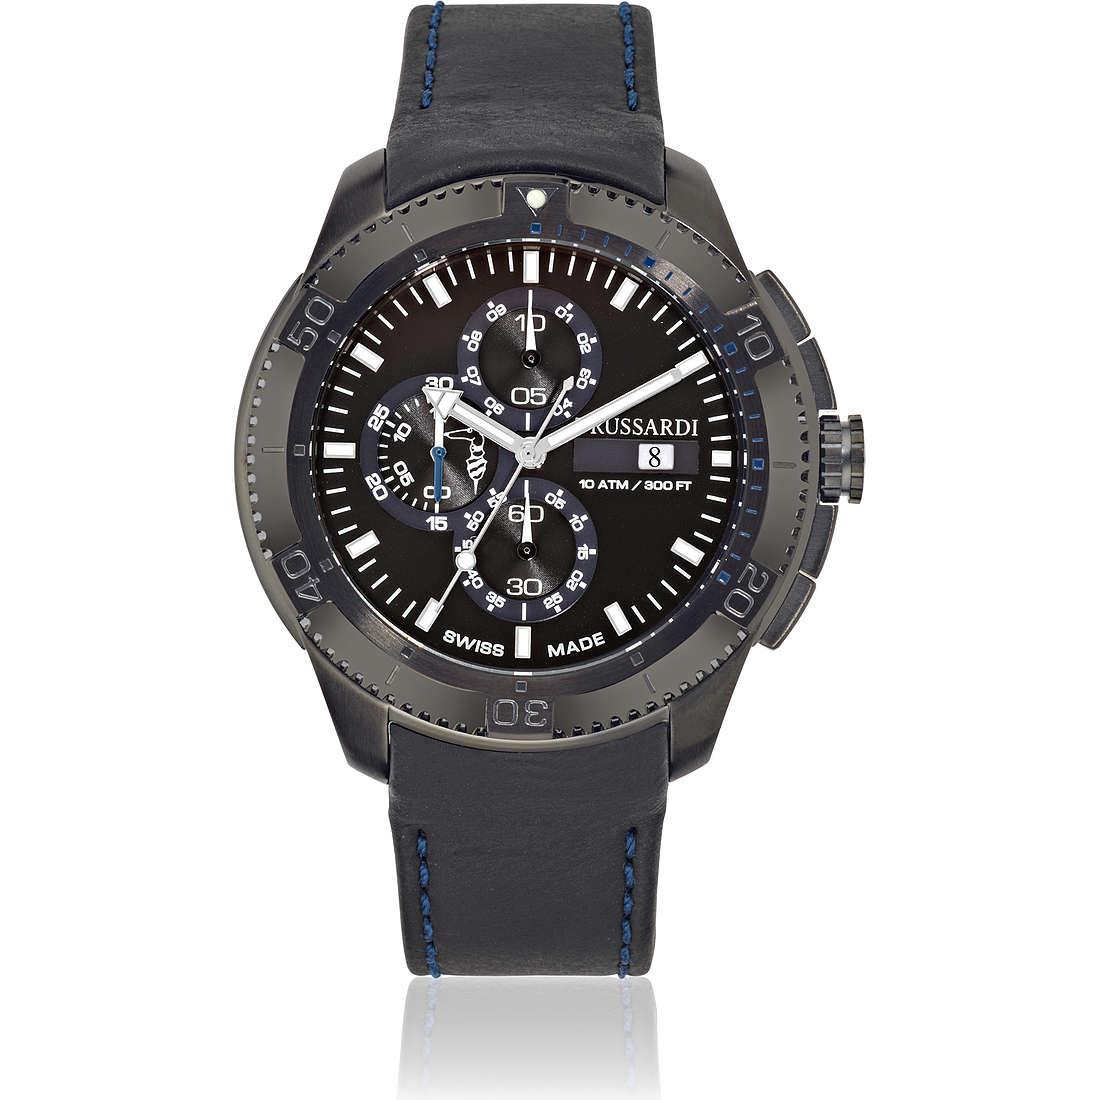 watch chronograph man Trussardi Sportsman R2471601001